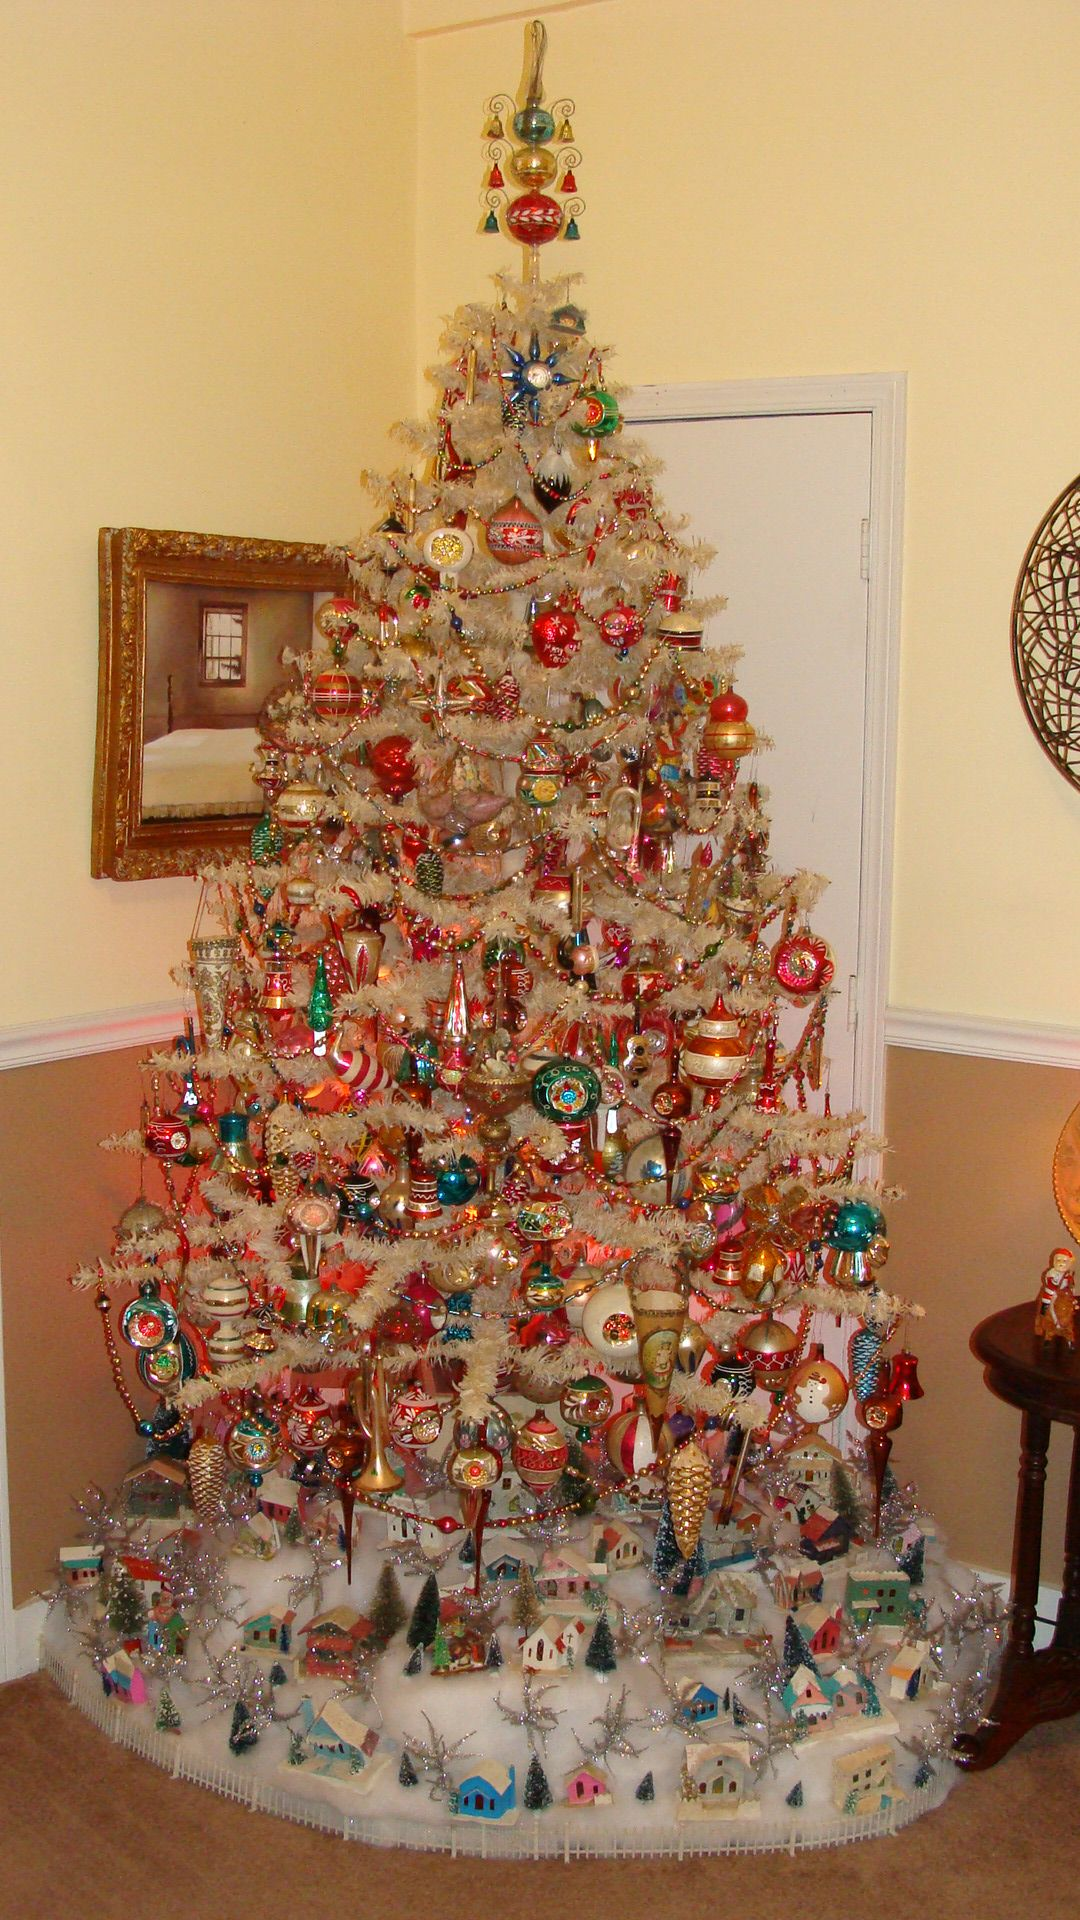 Vintage Christmas Vintage Christmas Decorations Vintage Christmas Tree Retro Christmas Decorations